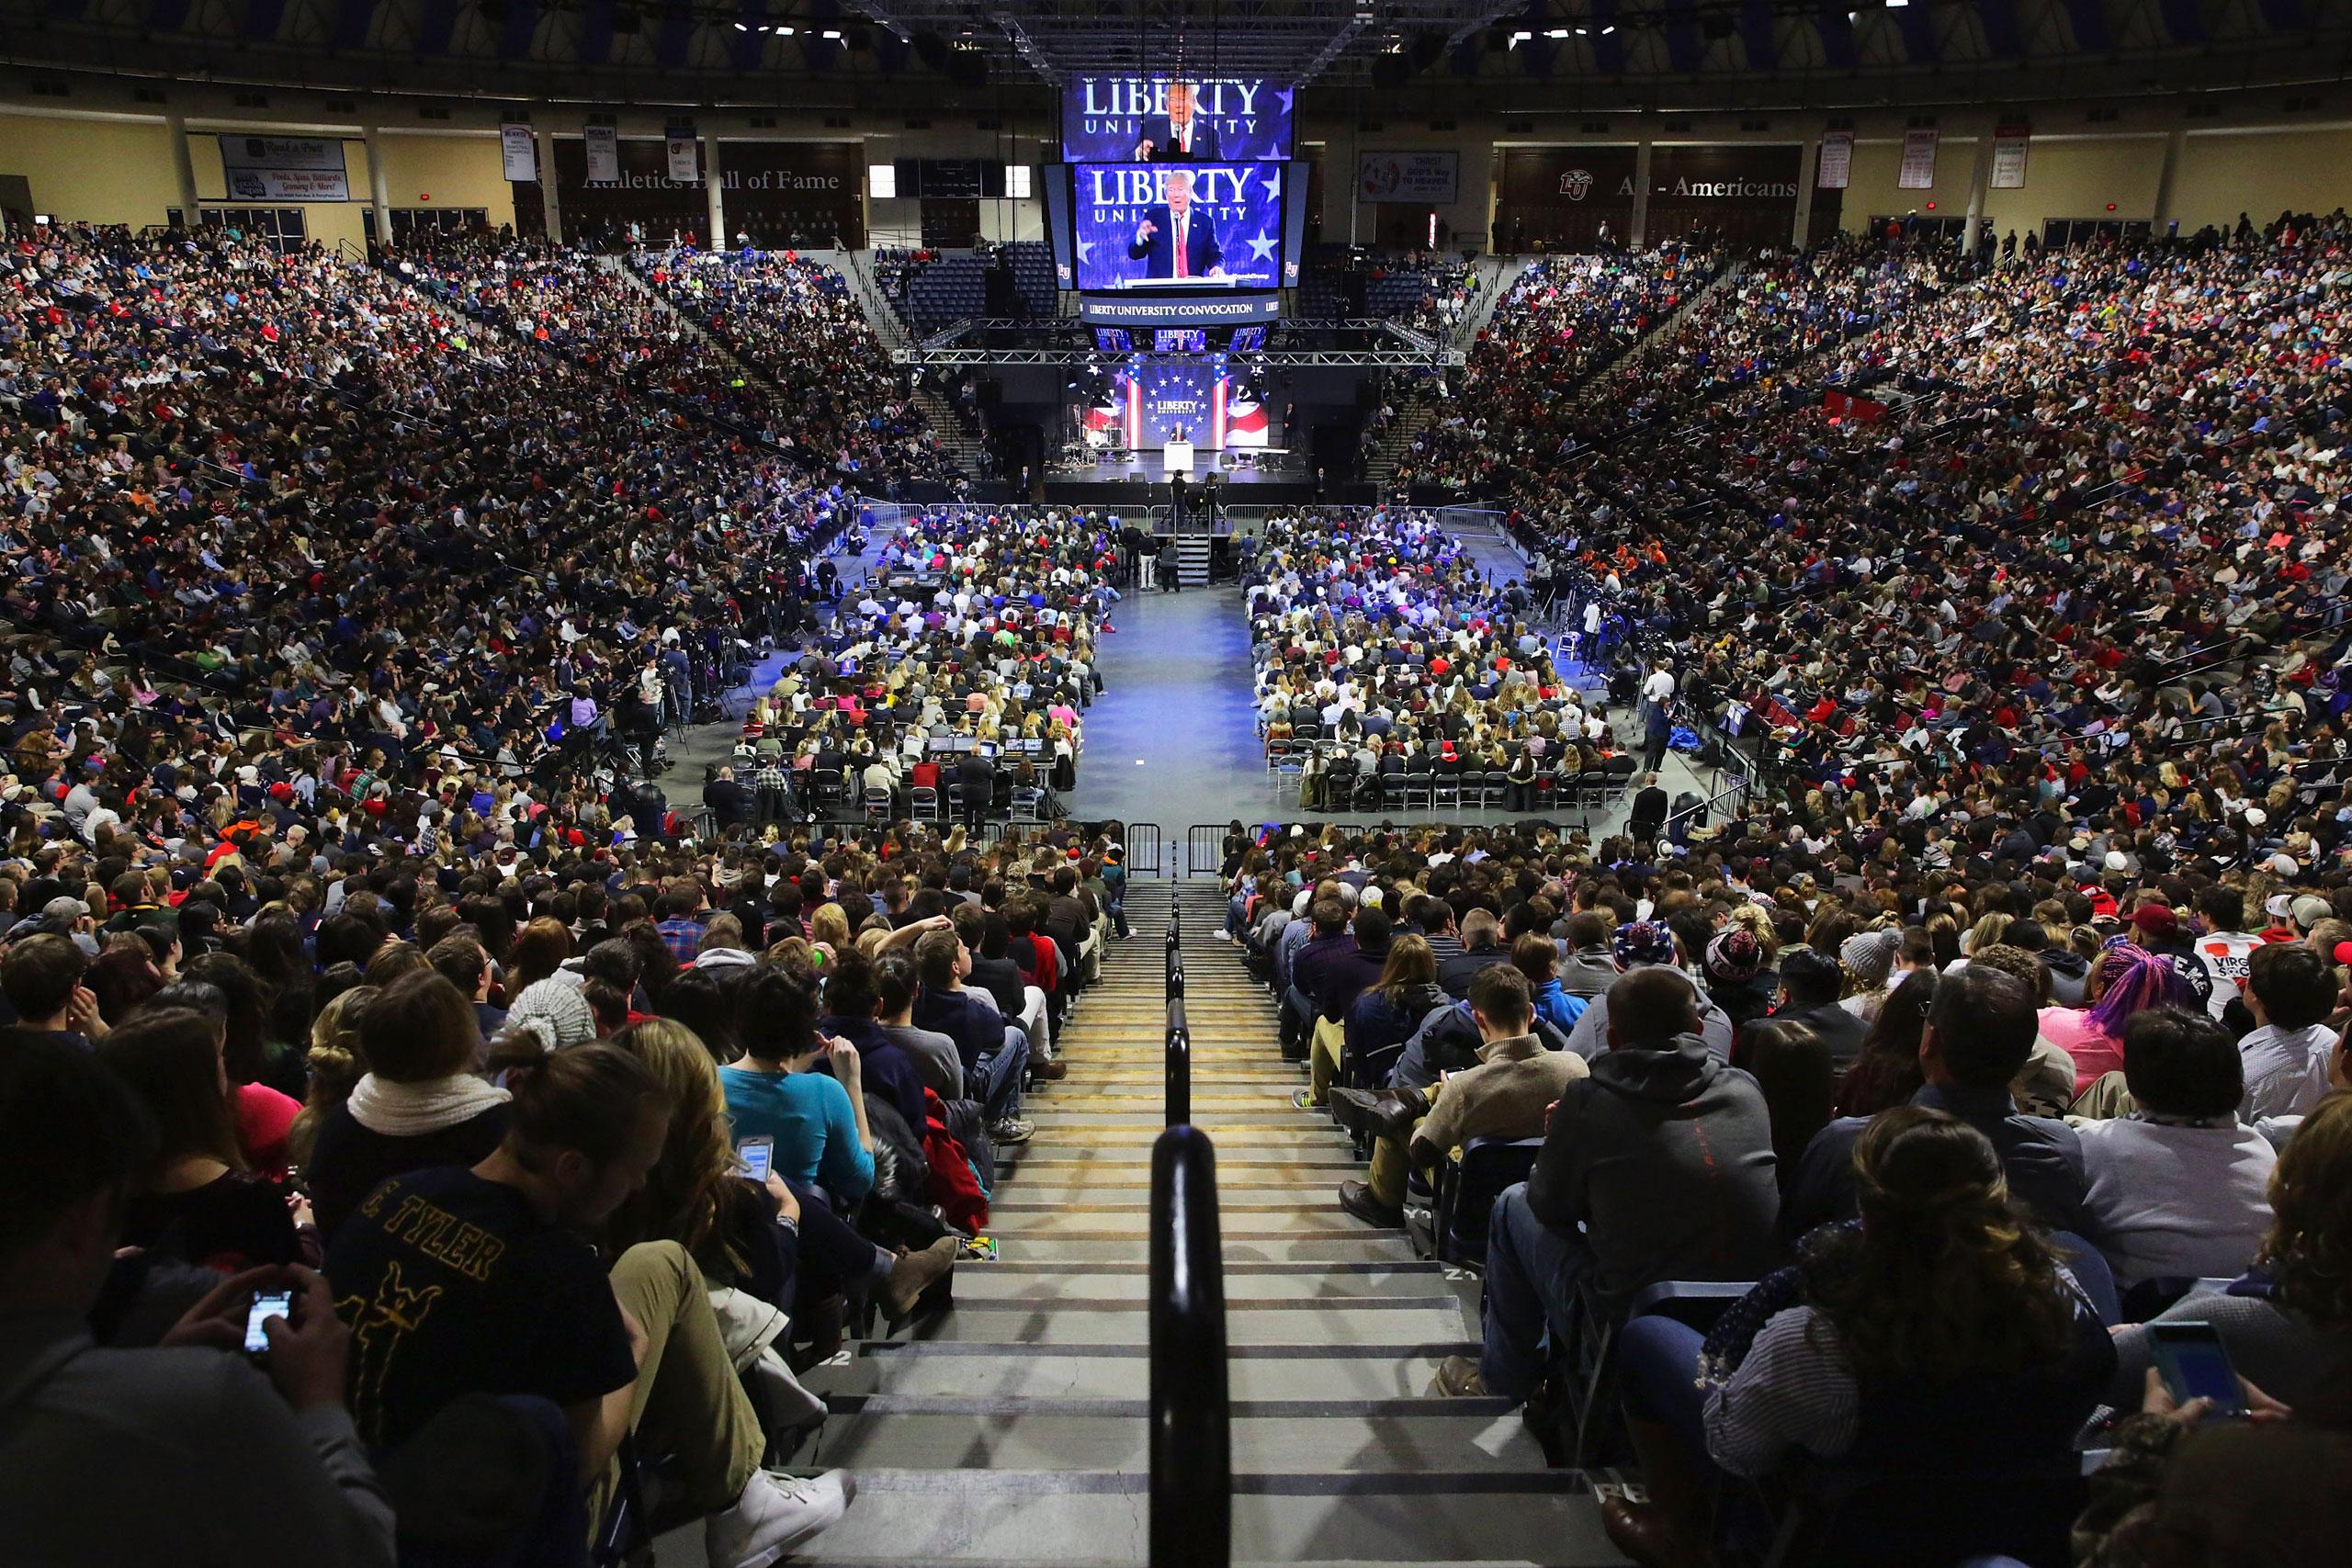 Trump spoke in January at JerryFalwell Jr.'s Liberty University in Lynchburg, Va.